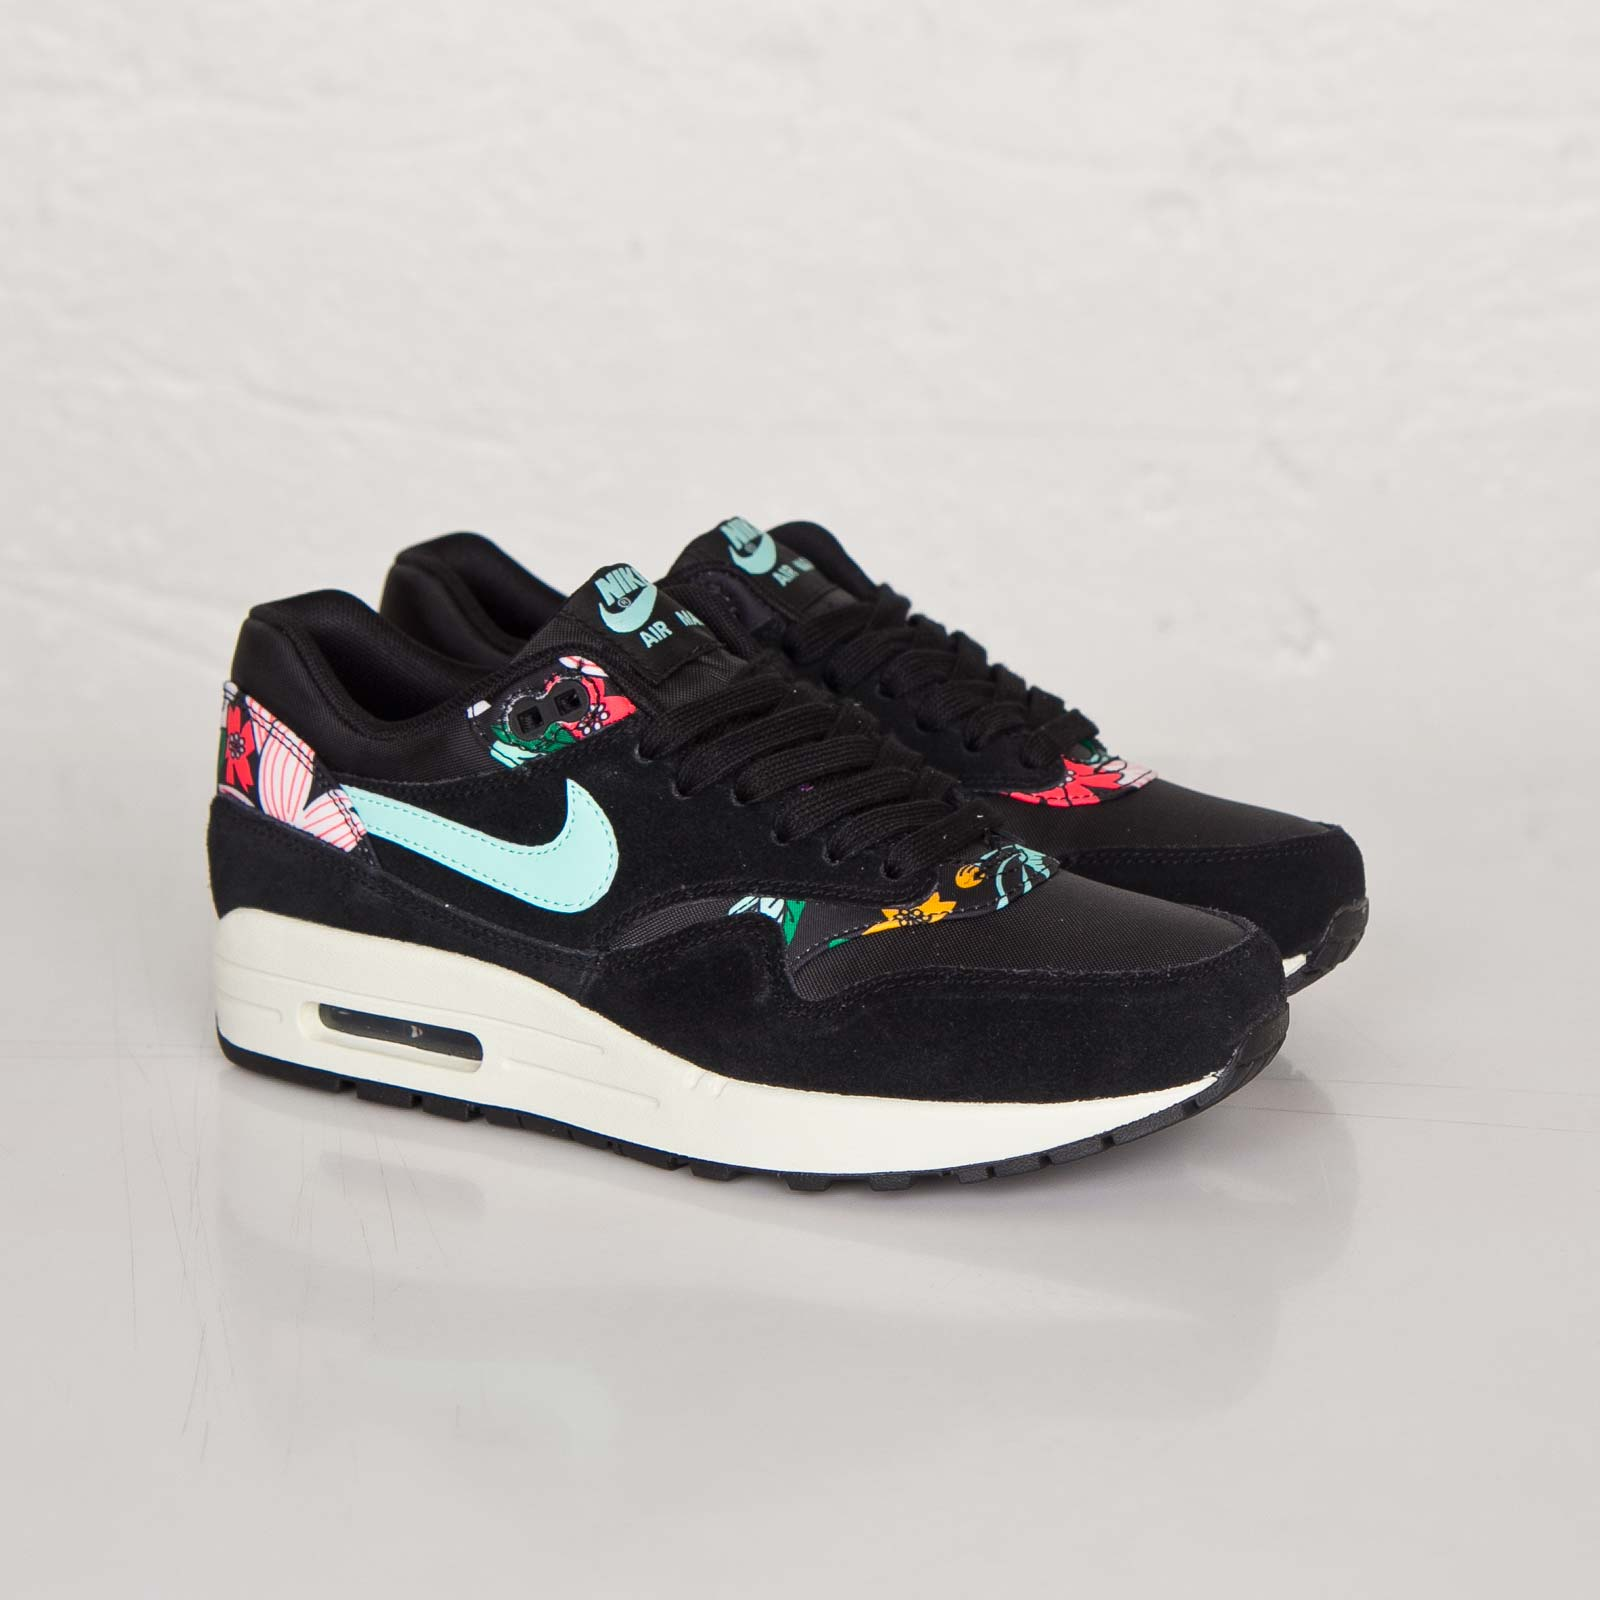 Nike Wmns Air Max 1 Print 528898 003 Sneakersnstuff